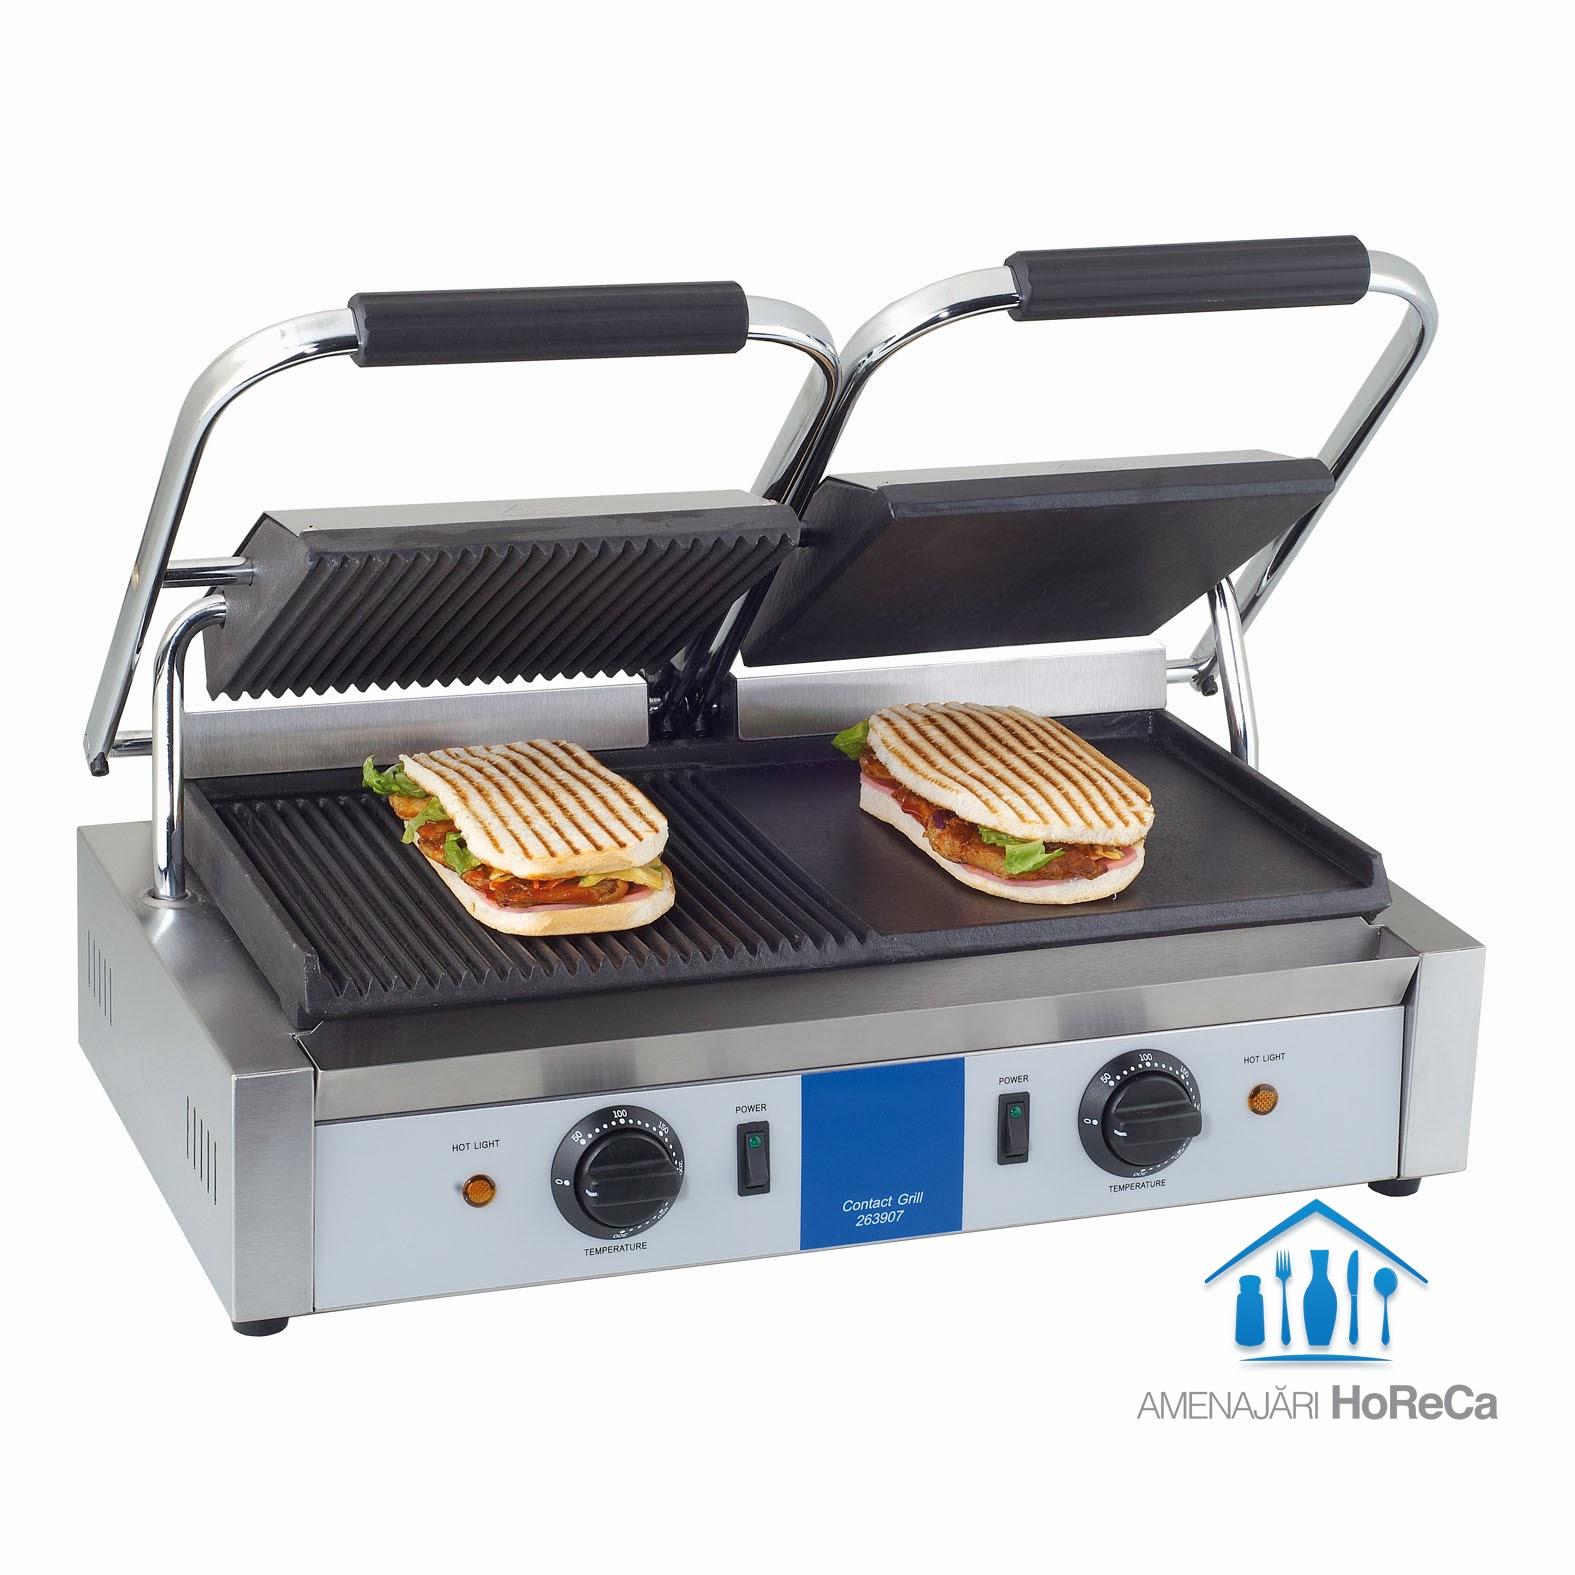 Sandwich Maker Grill, Model Dublu, Utilaje Fast Food, HoReCa